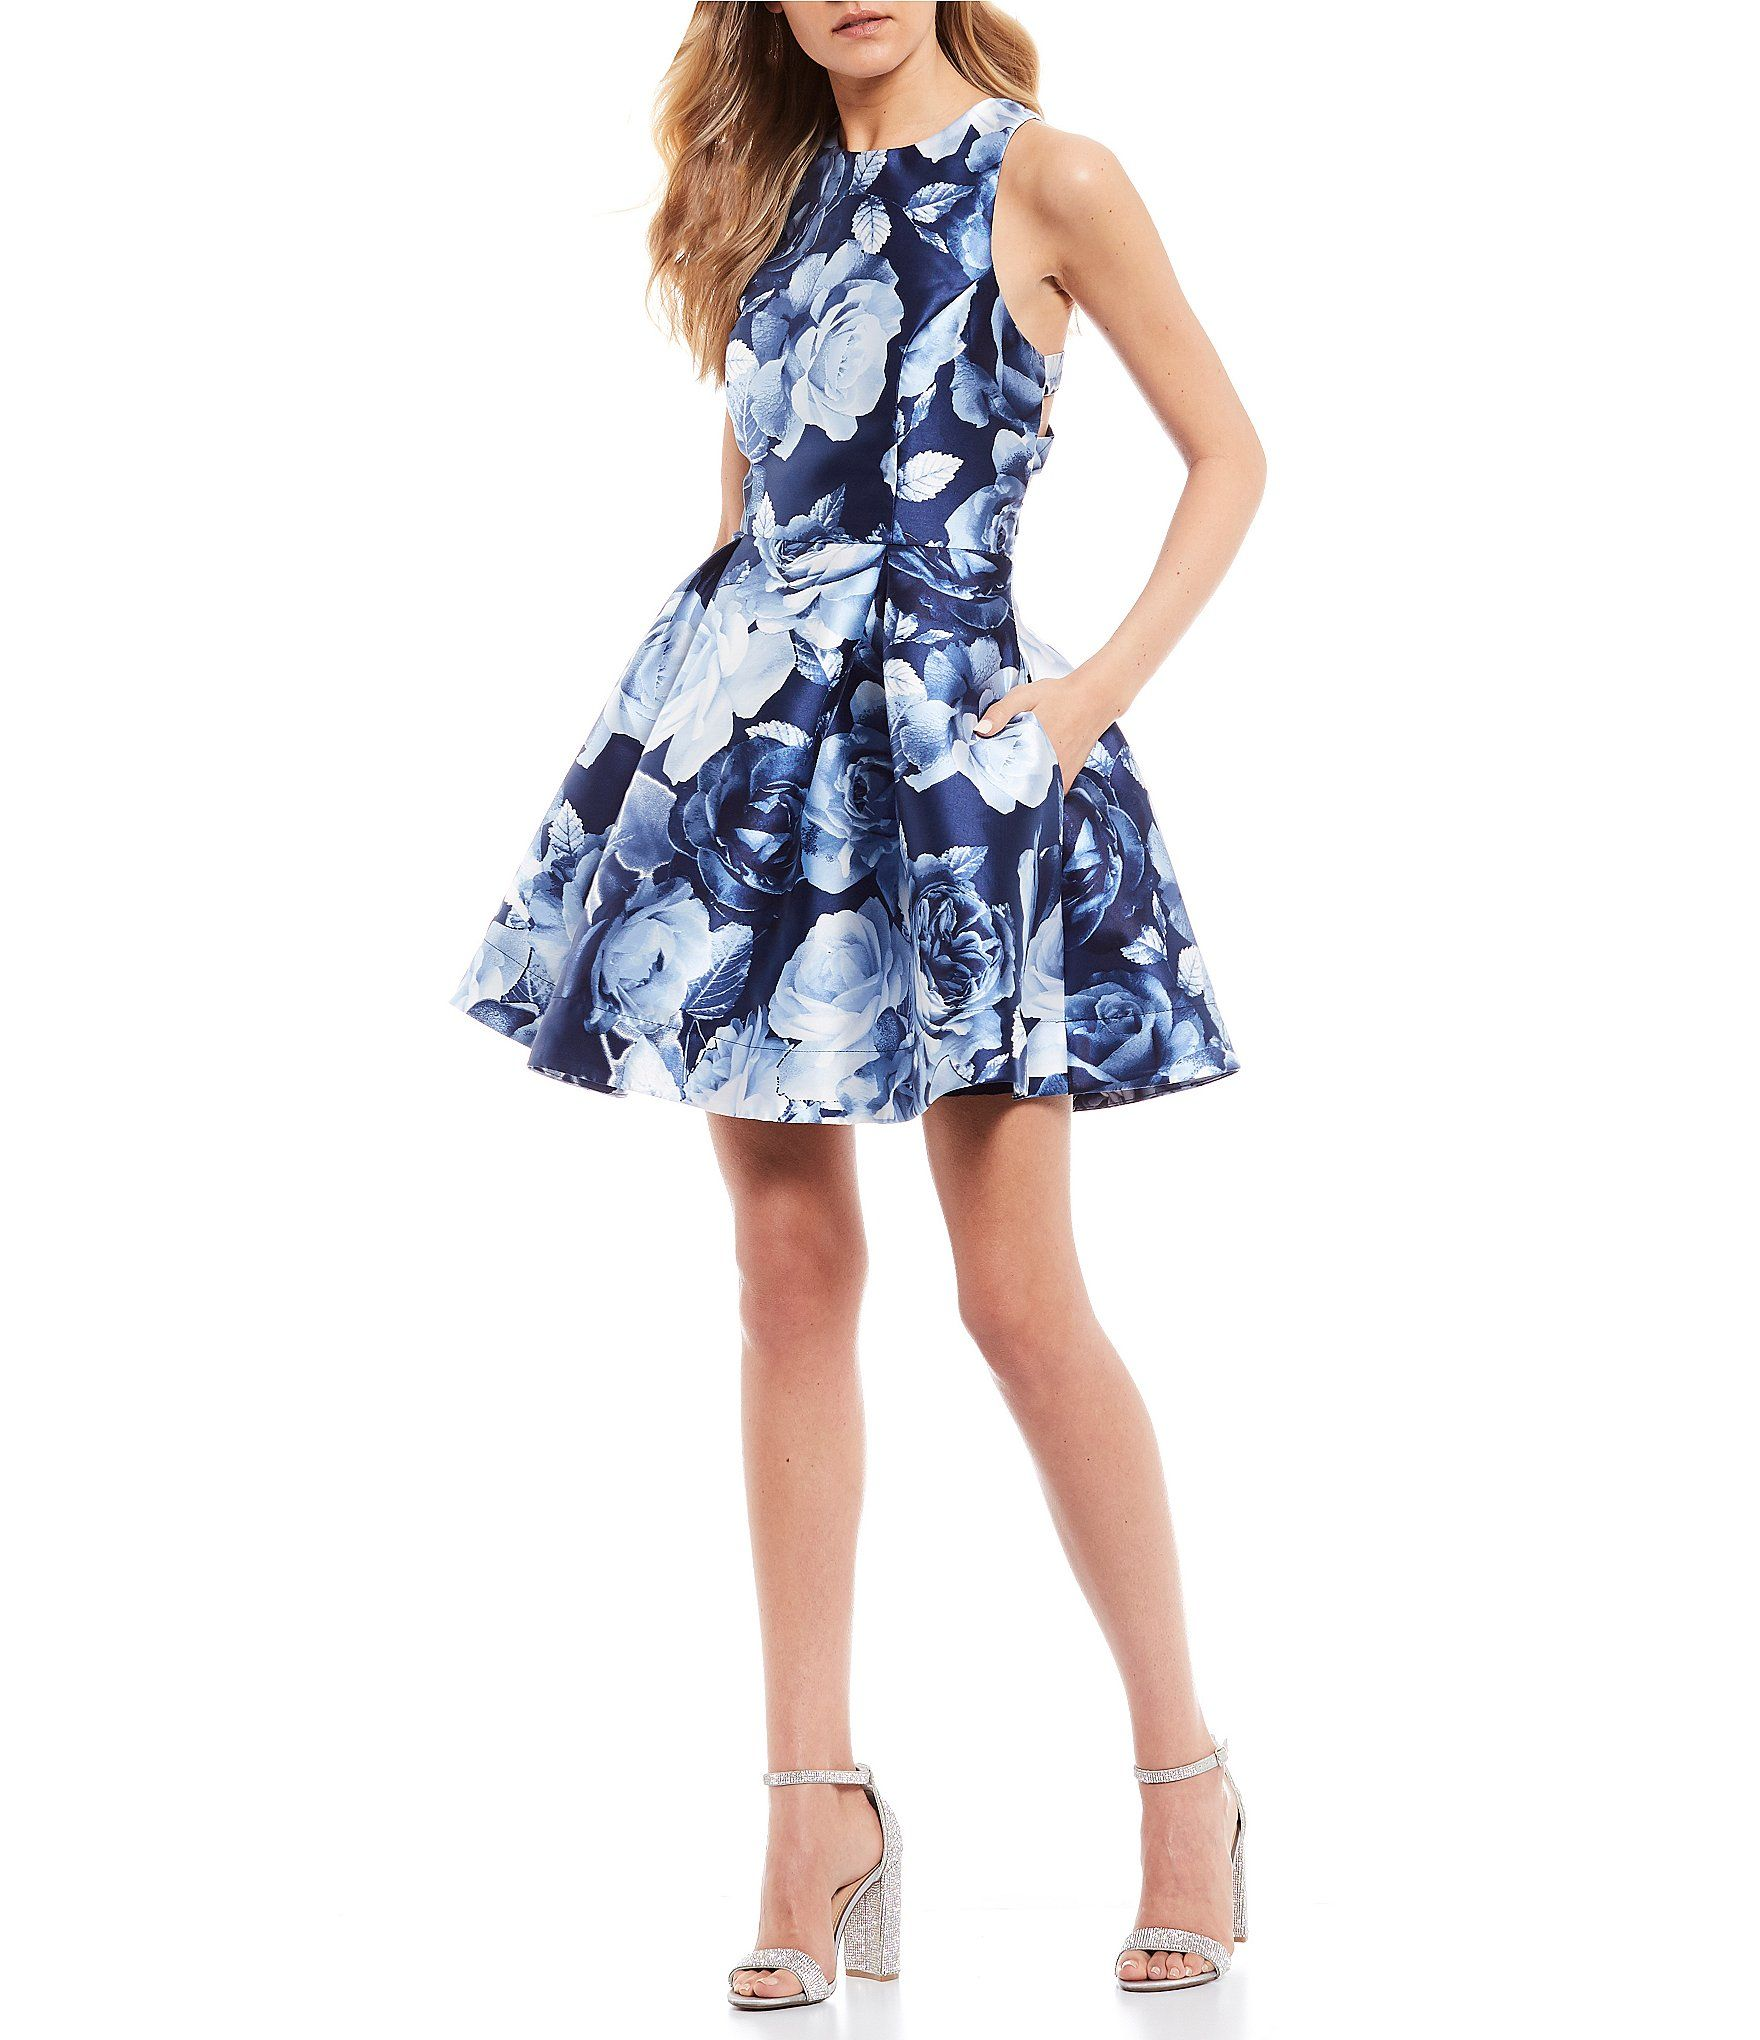 Xtraordinary Sleeveless High-Neck Floral Print Mikado Fit-and-Flare Dress | Dillard's